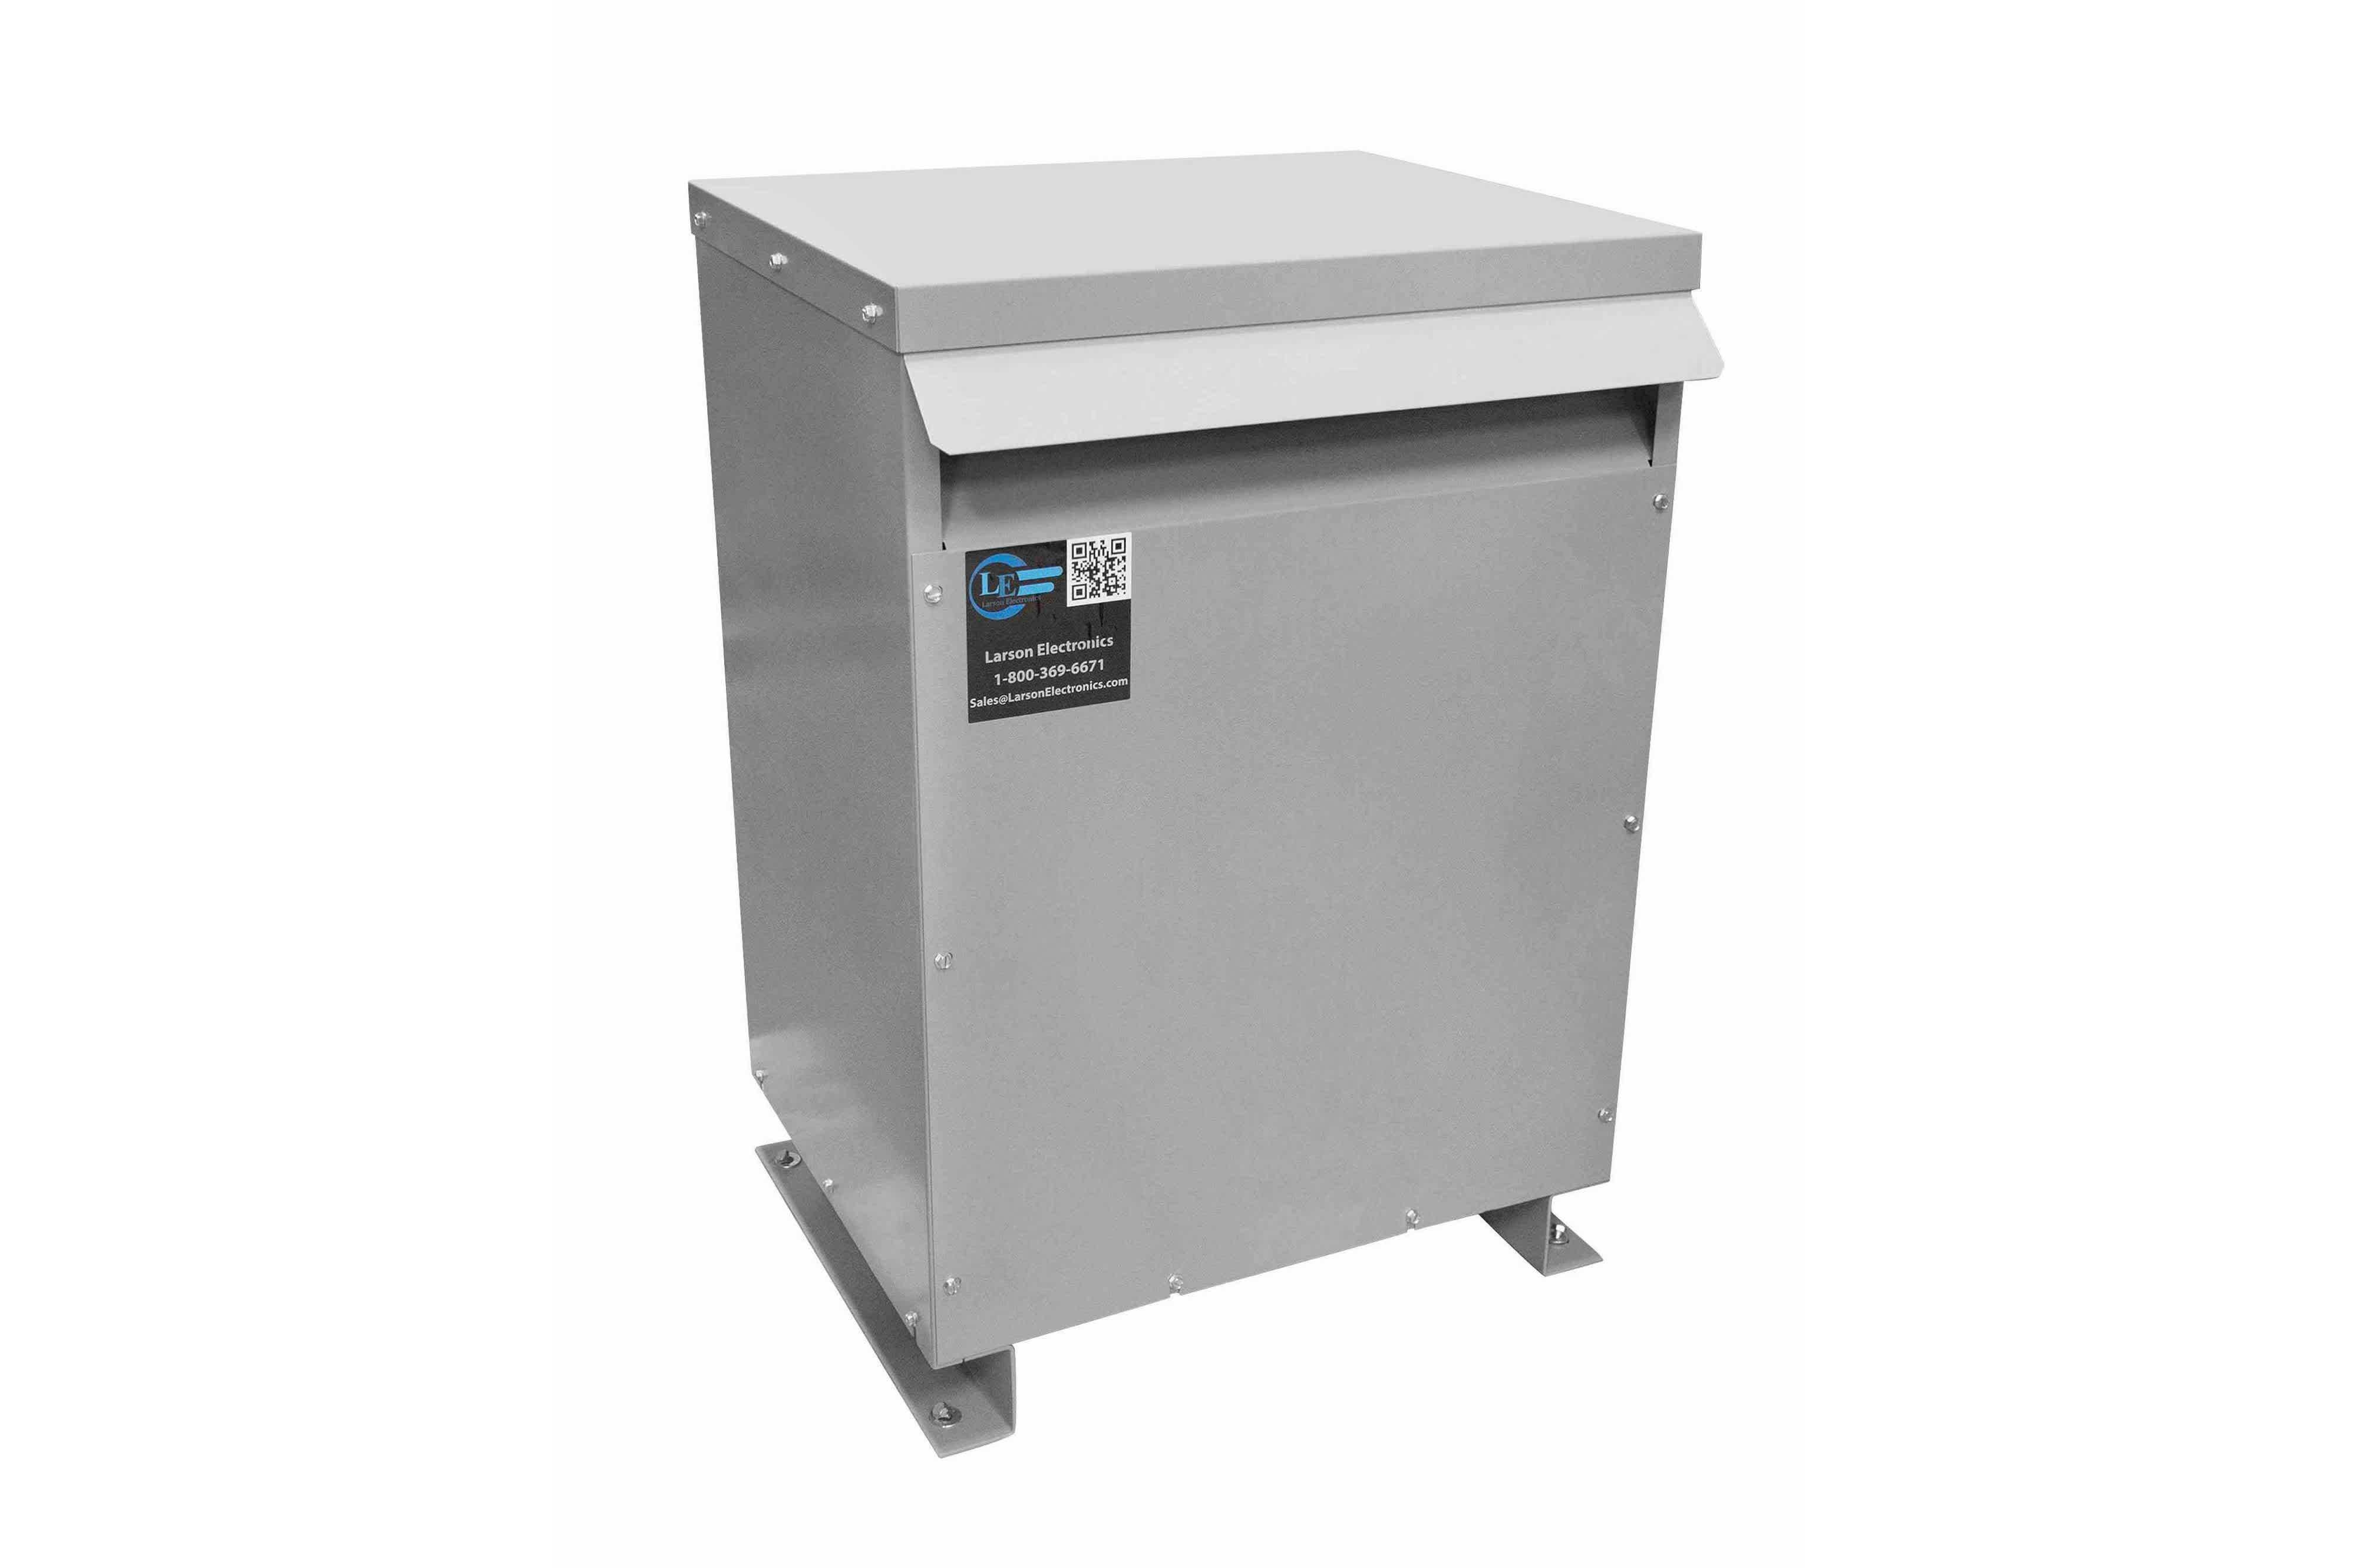 40 kVA 3PH Isolation Transformer, 575V Wye Primary, 208V Delta Secondary, N3R, Ventilated, 60 Hz